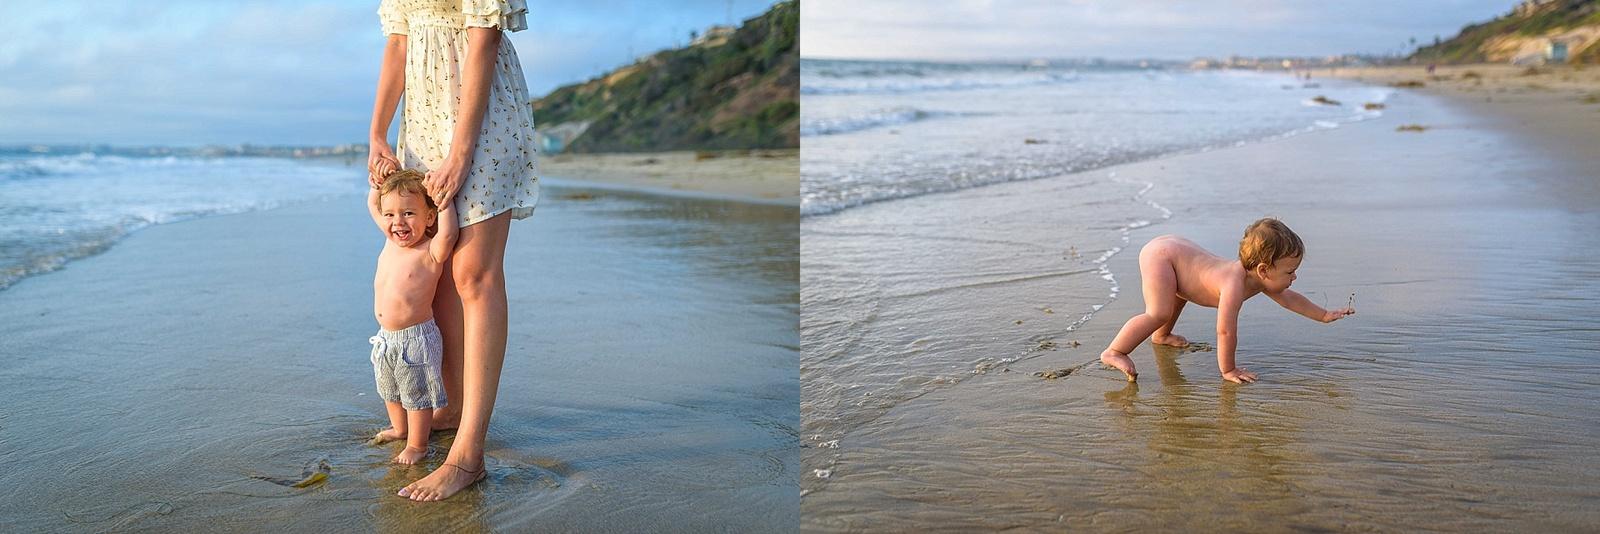 Naked baby on the beach for milestone photos